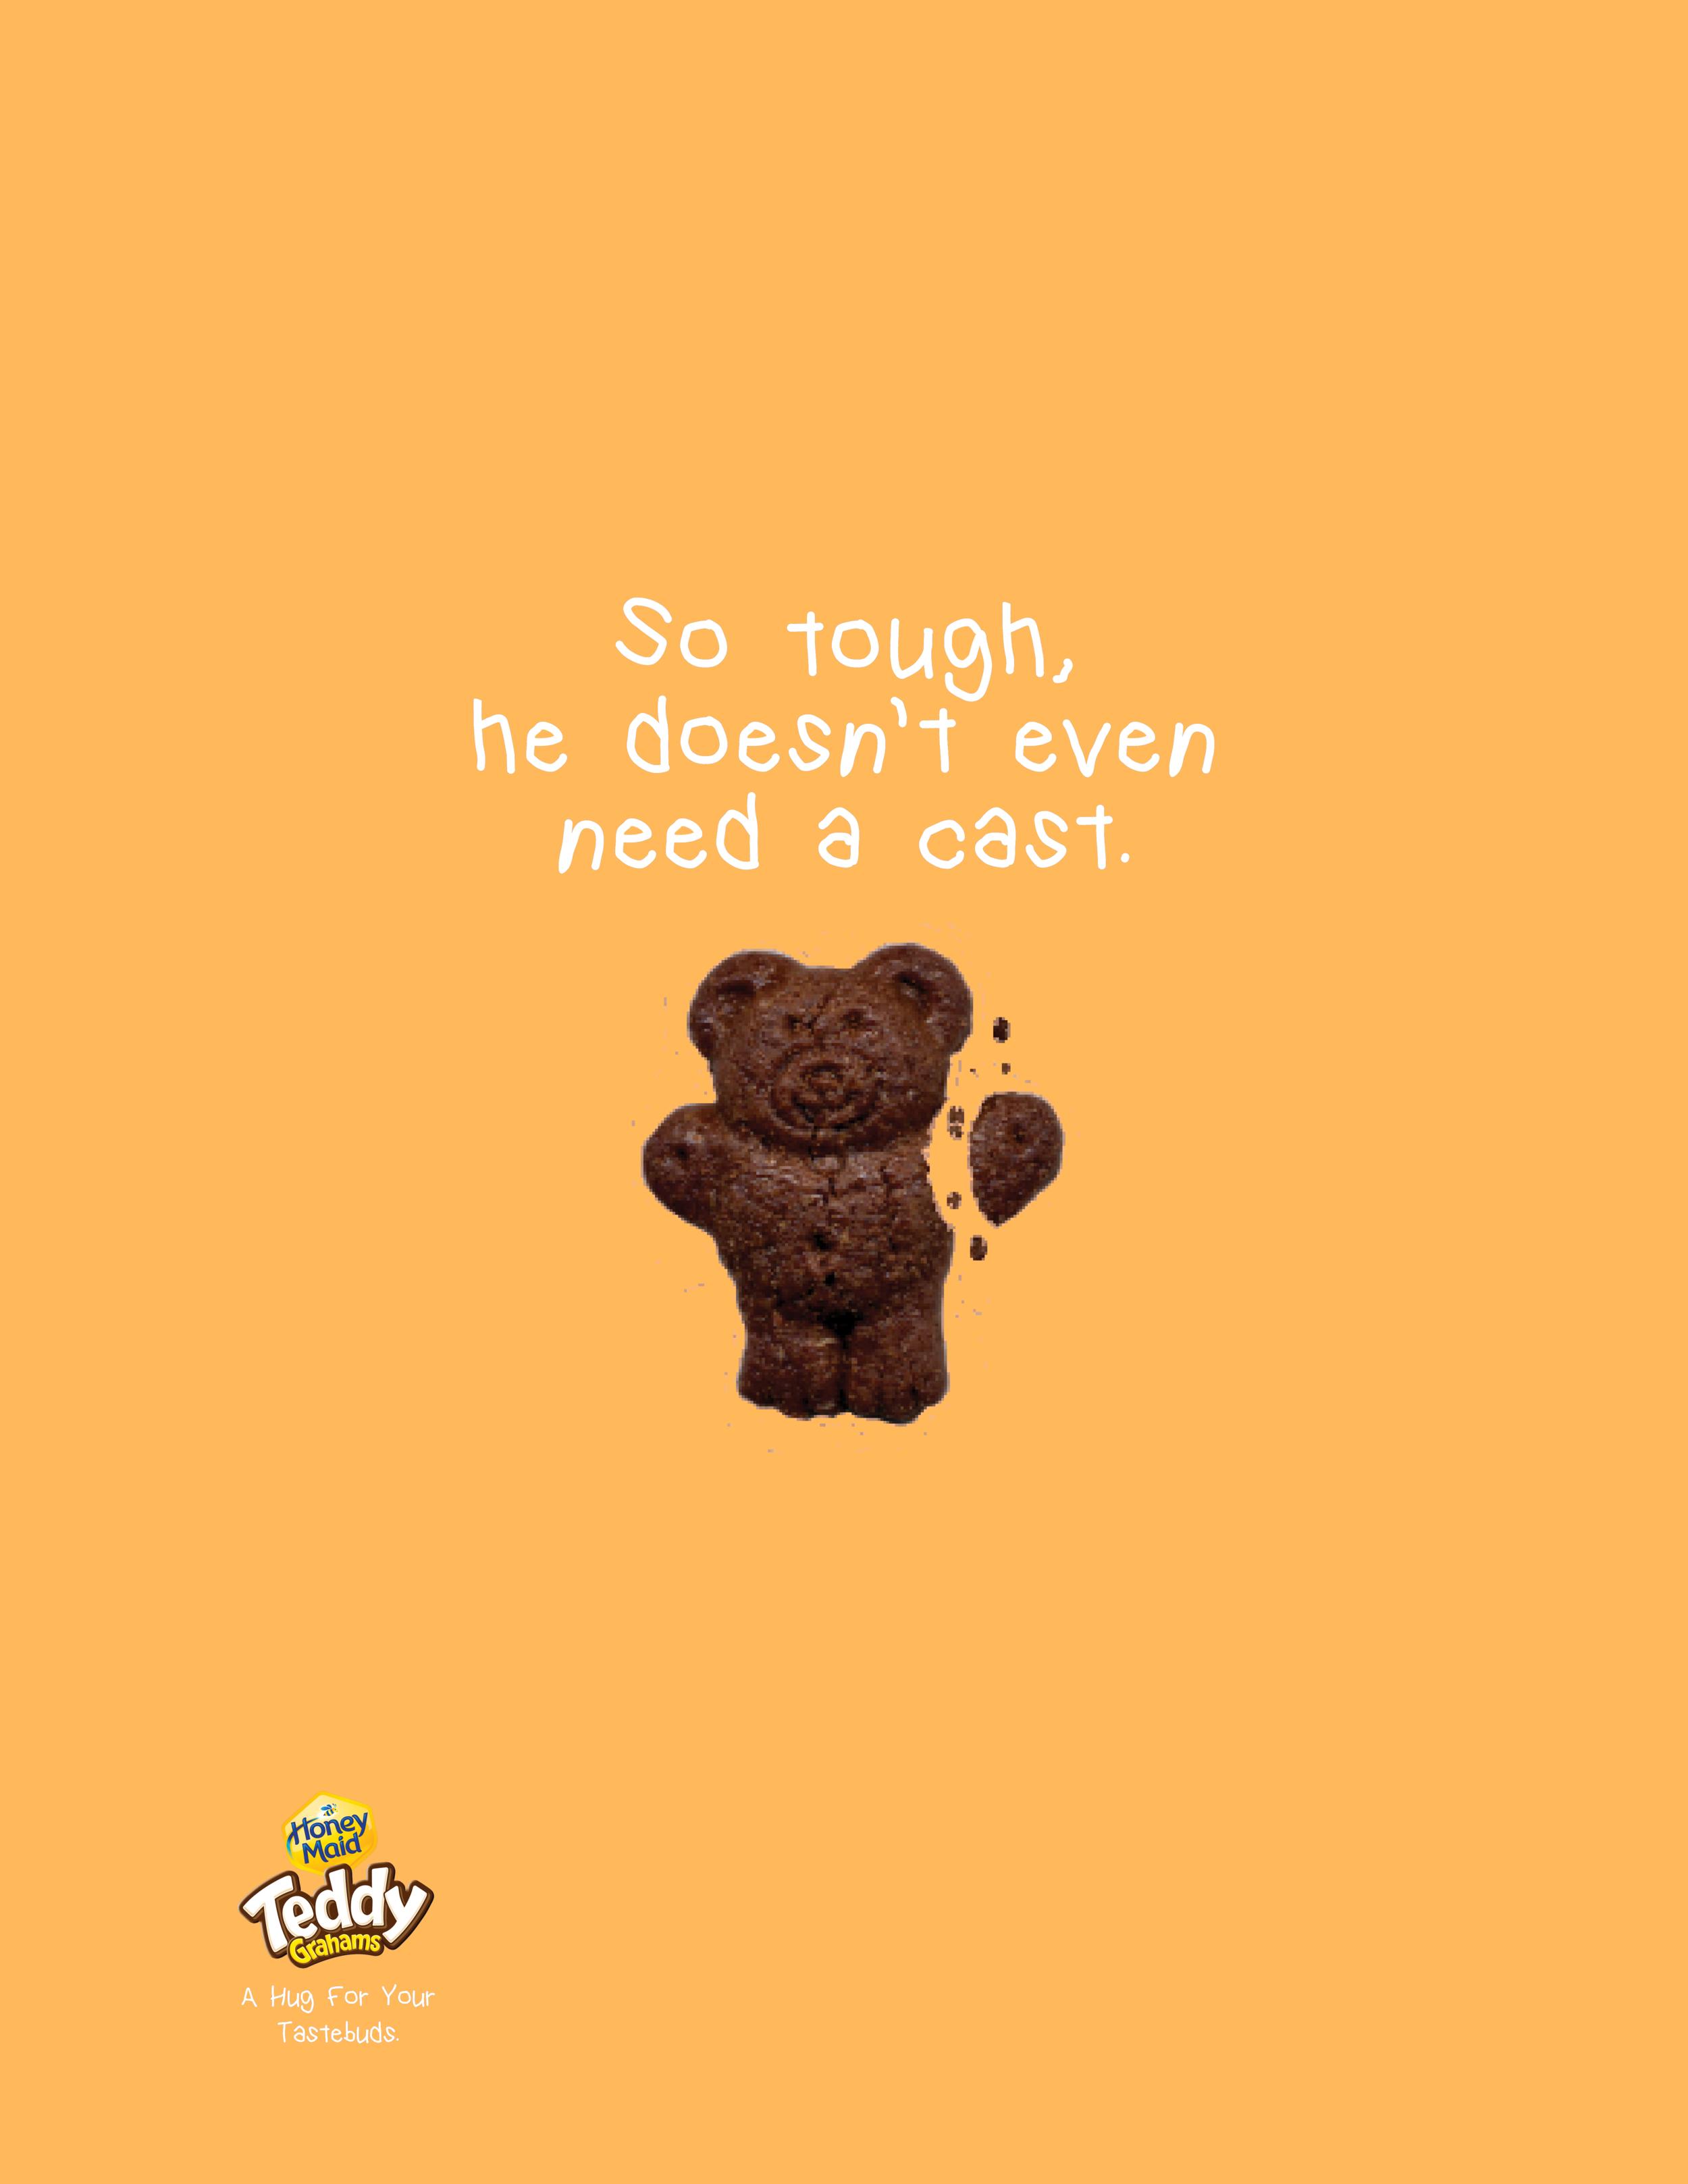 teddy2.0 copy.png